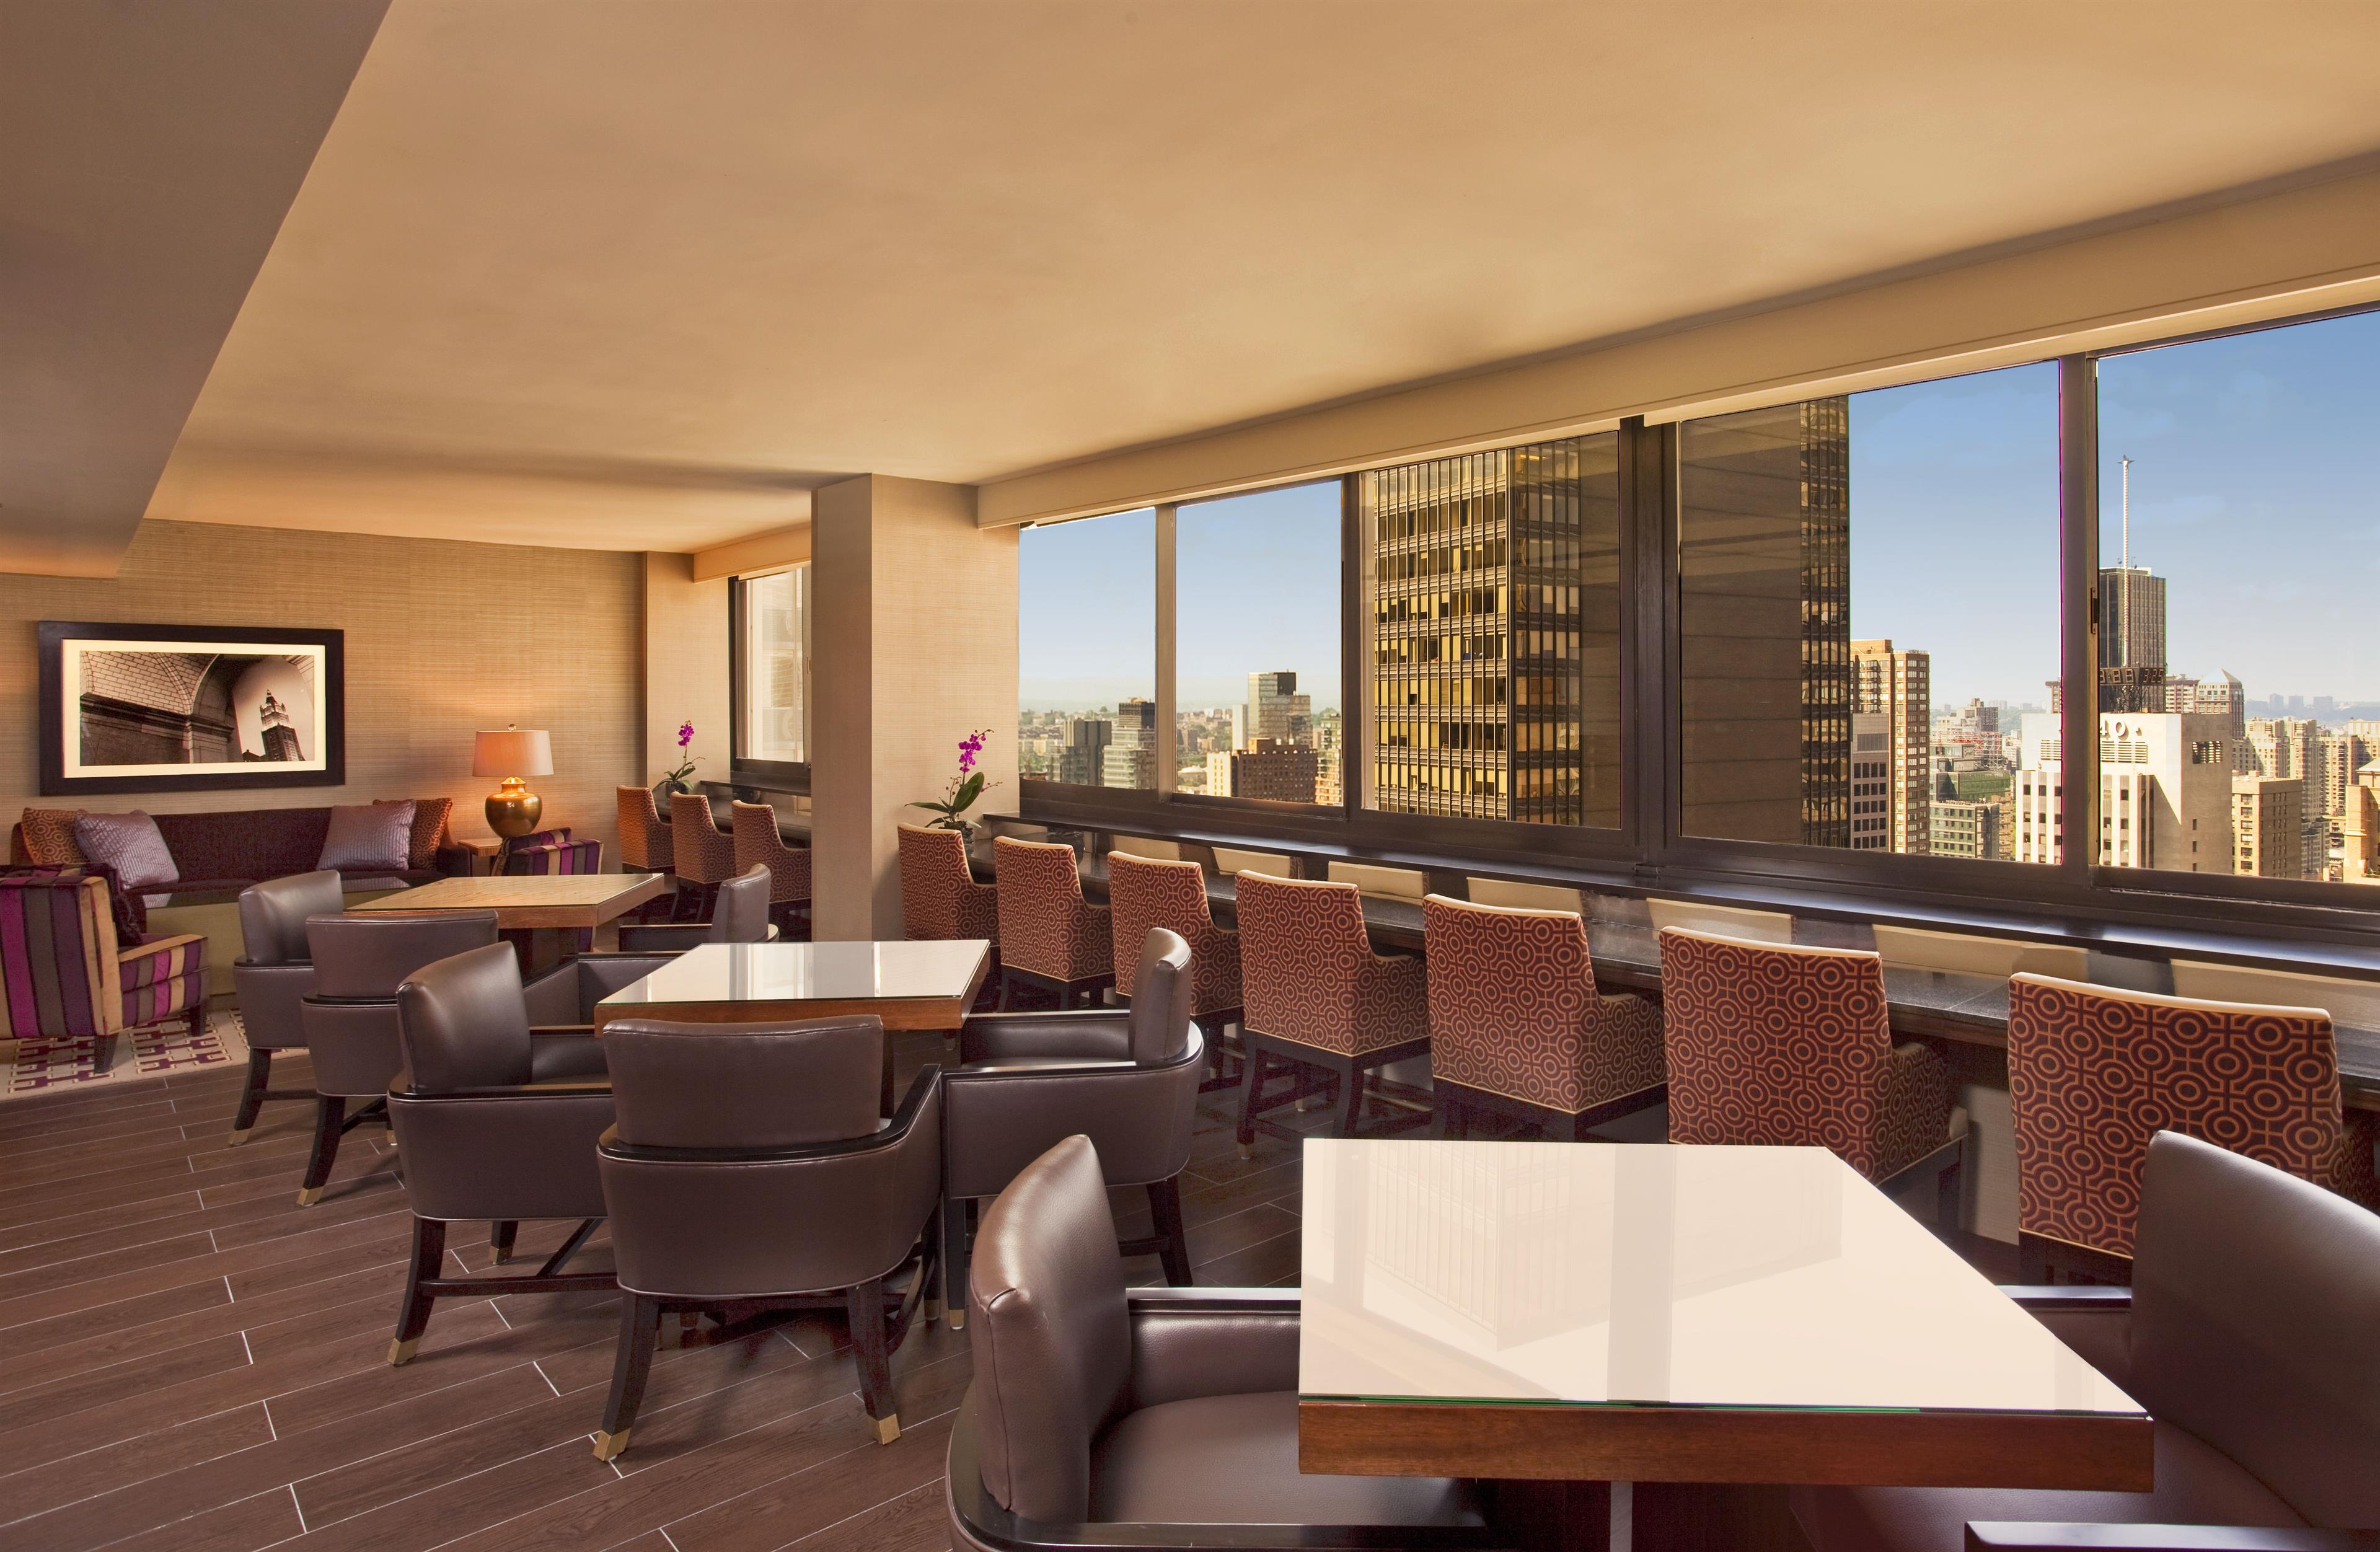 Sheraton New York Times Square Hotel image 17